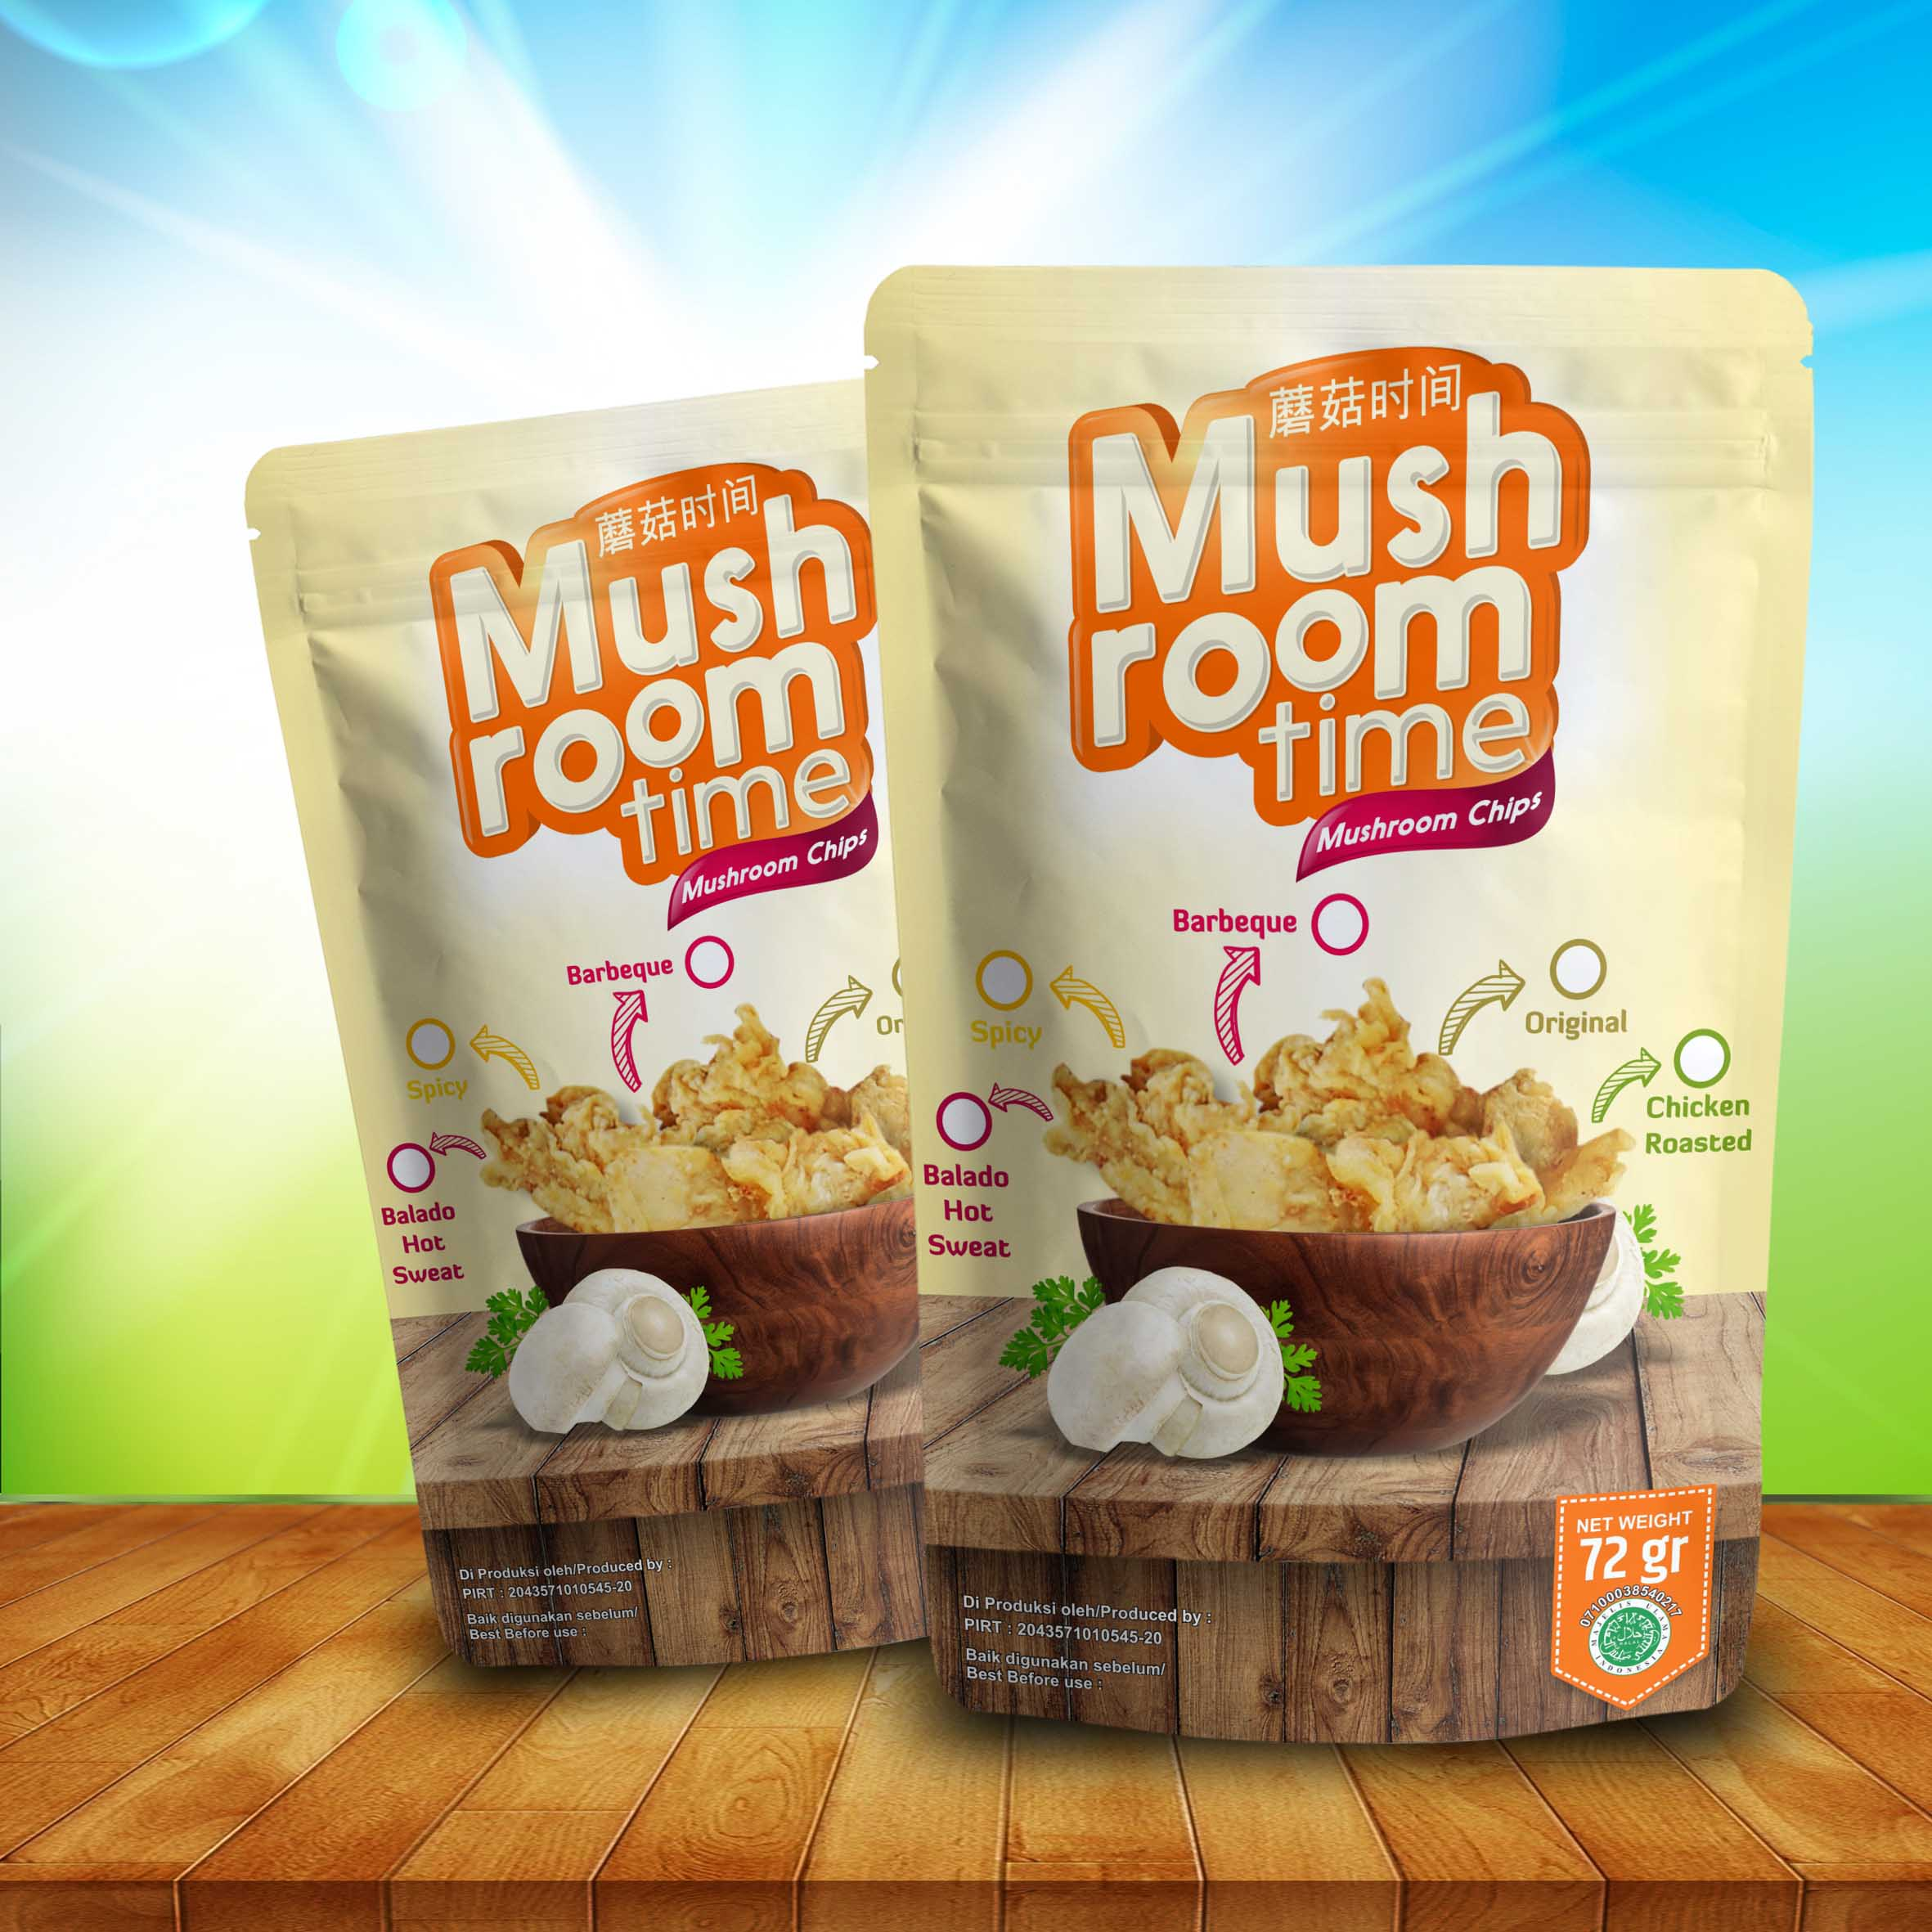 desain kemasan mushroom